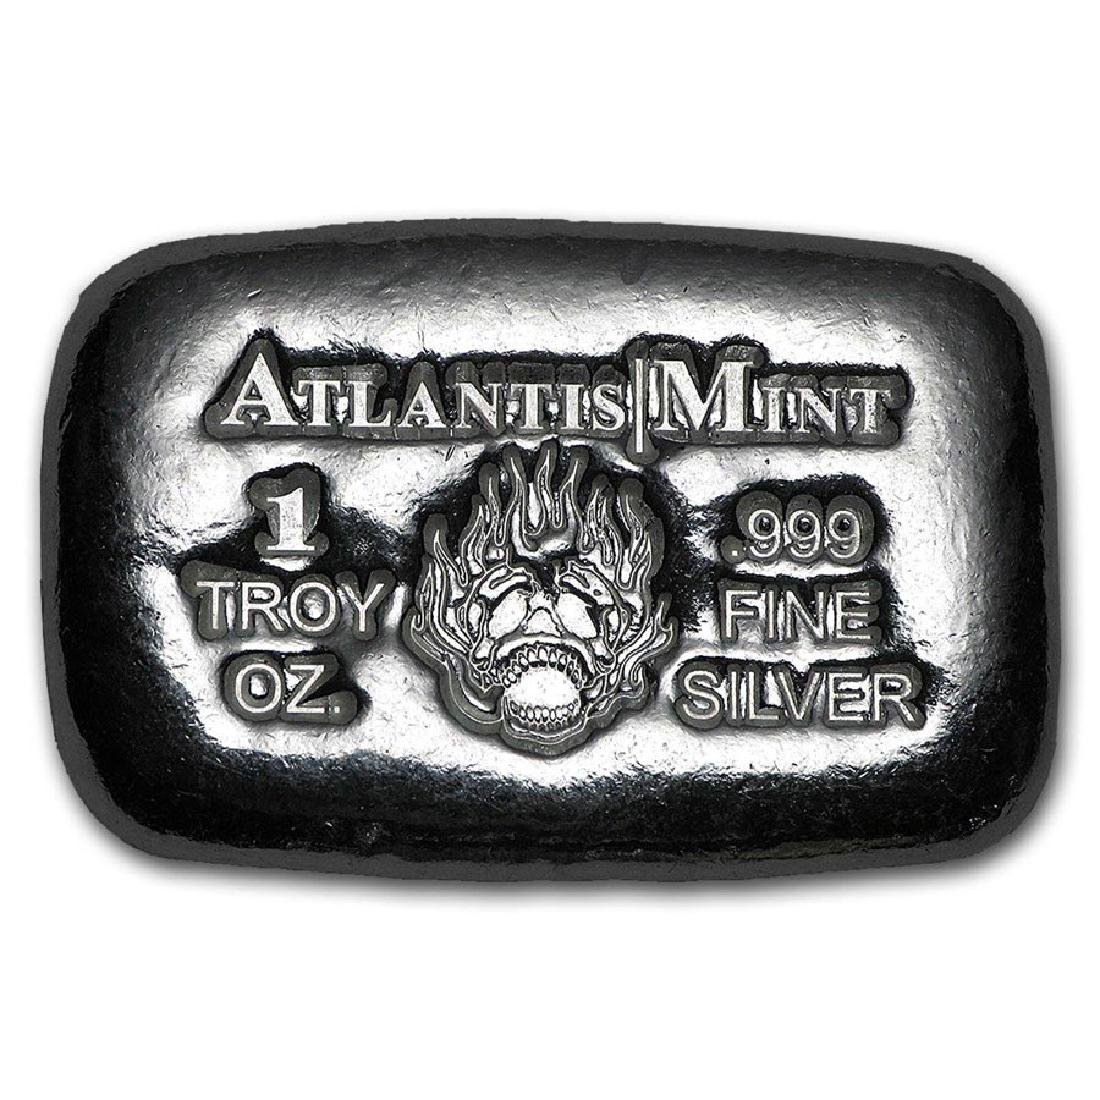 1 oz Silver Bar - Atlantis Mint (Skull & Flames)